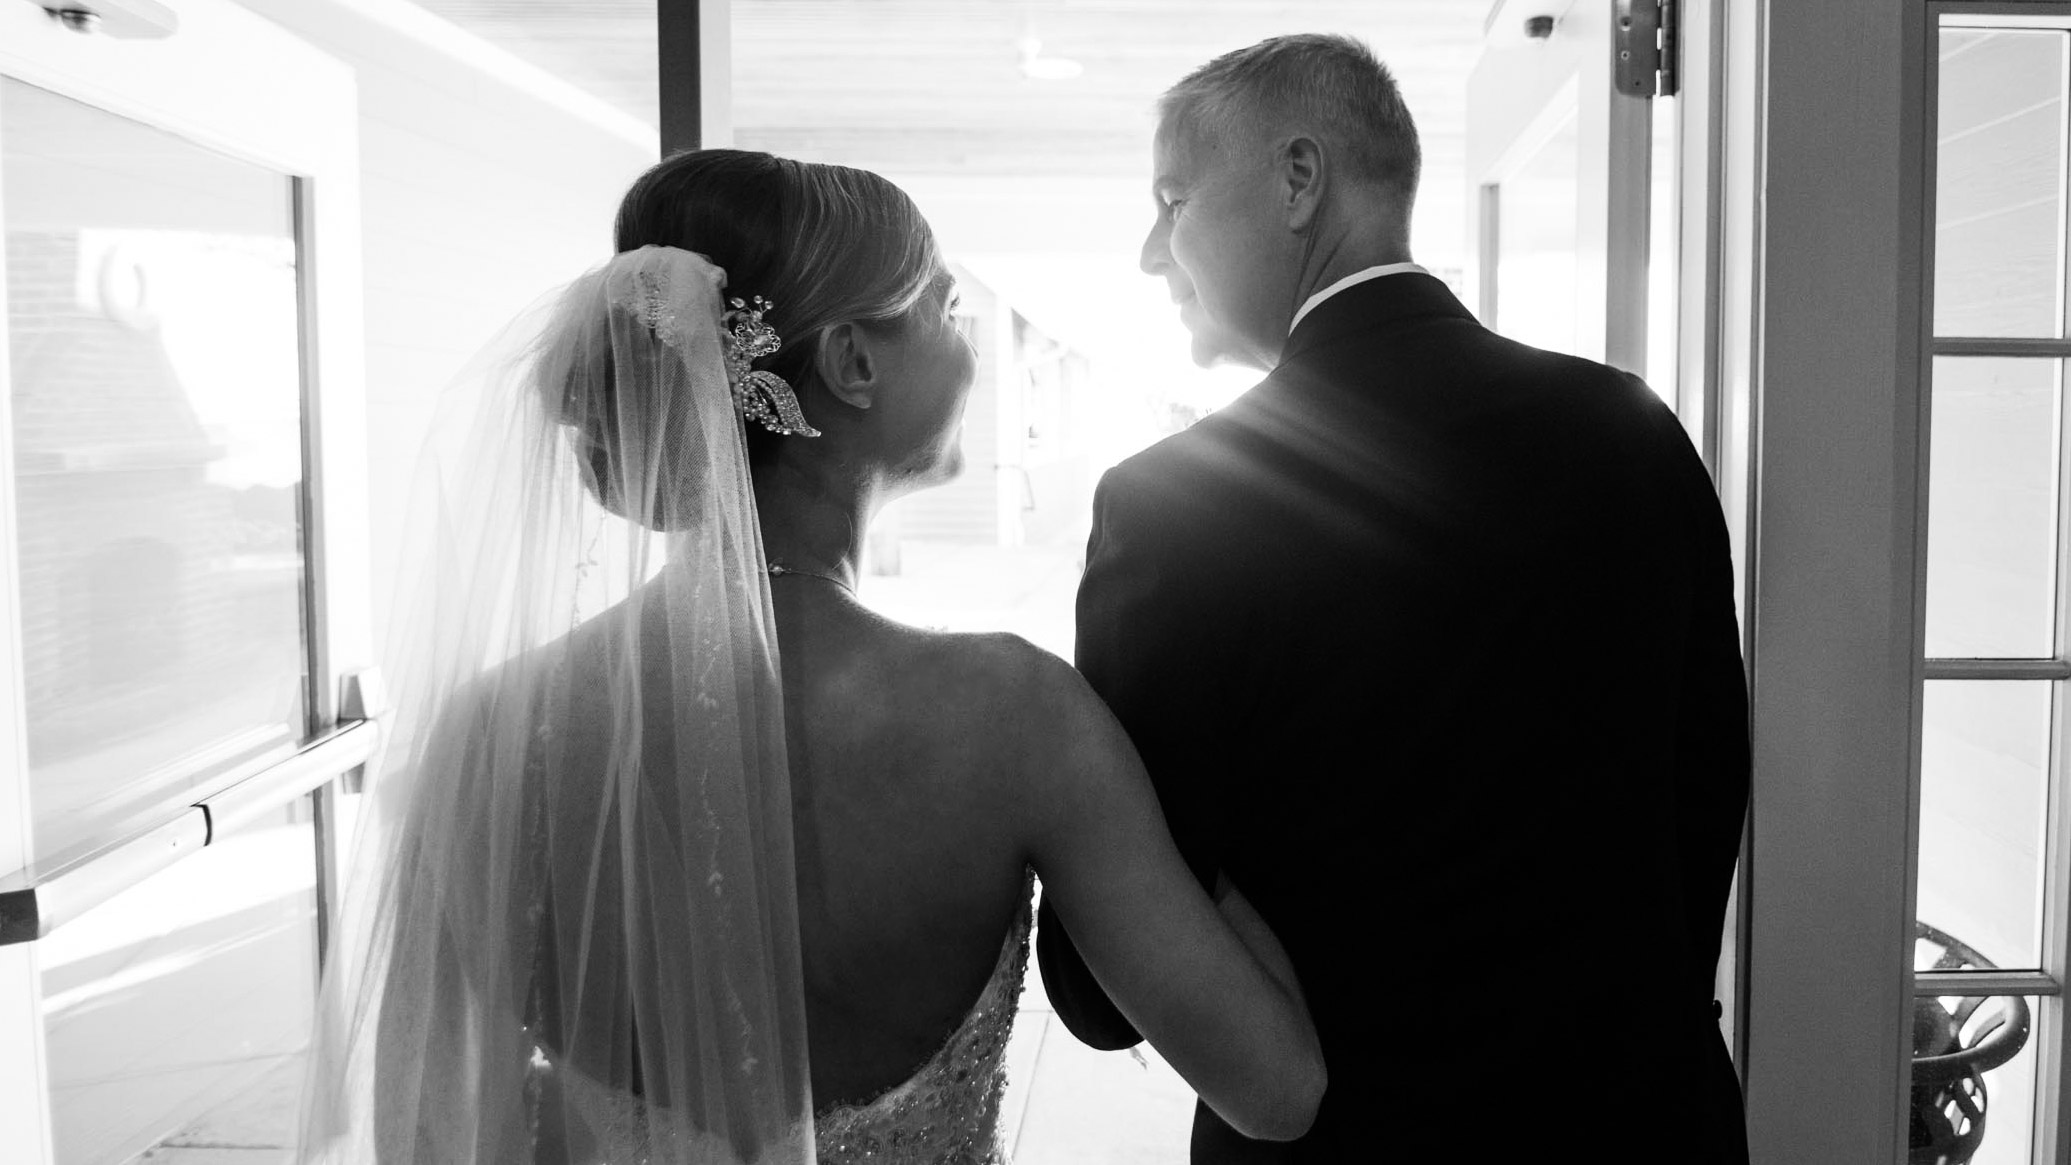 dc+metro+wedding+photographer+vadym+guliuk+photography+wedding+ceremony-2024.jpg